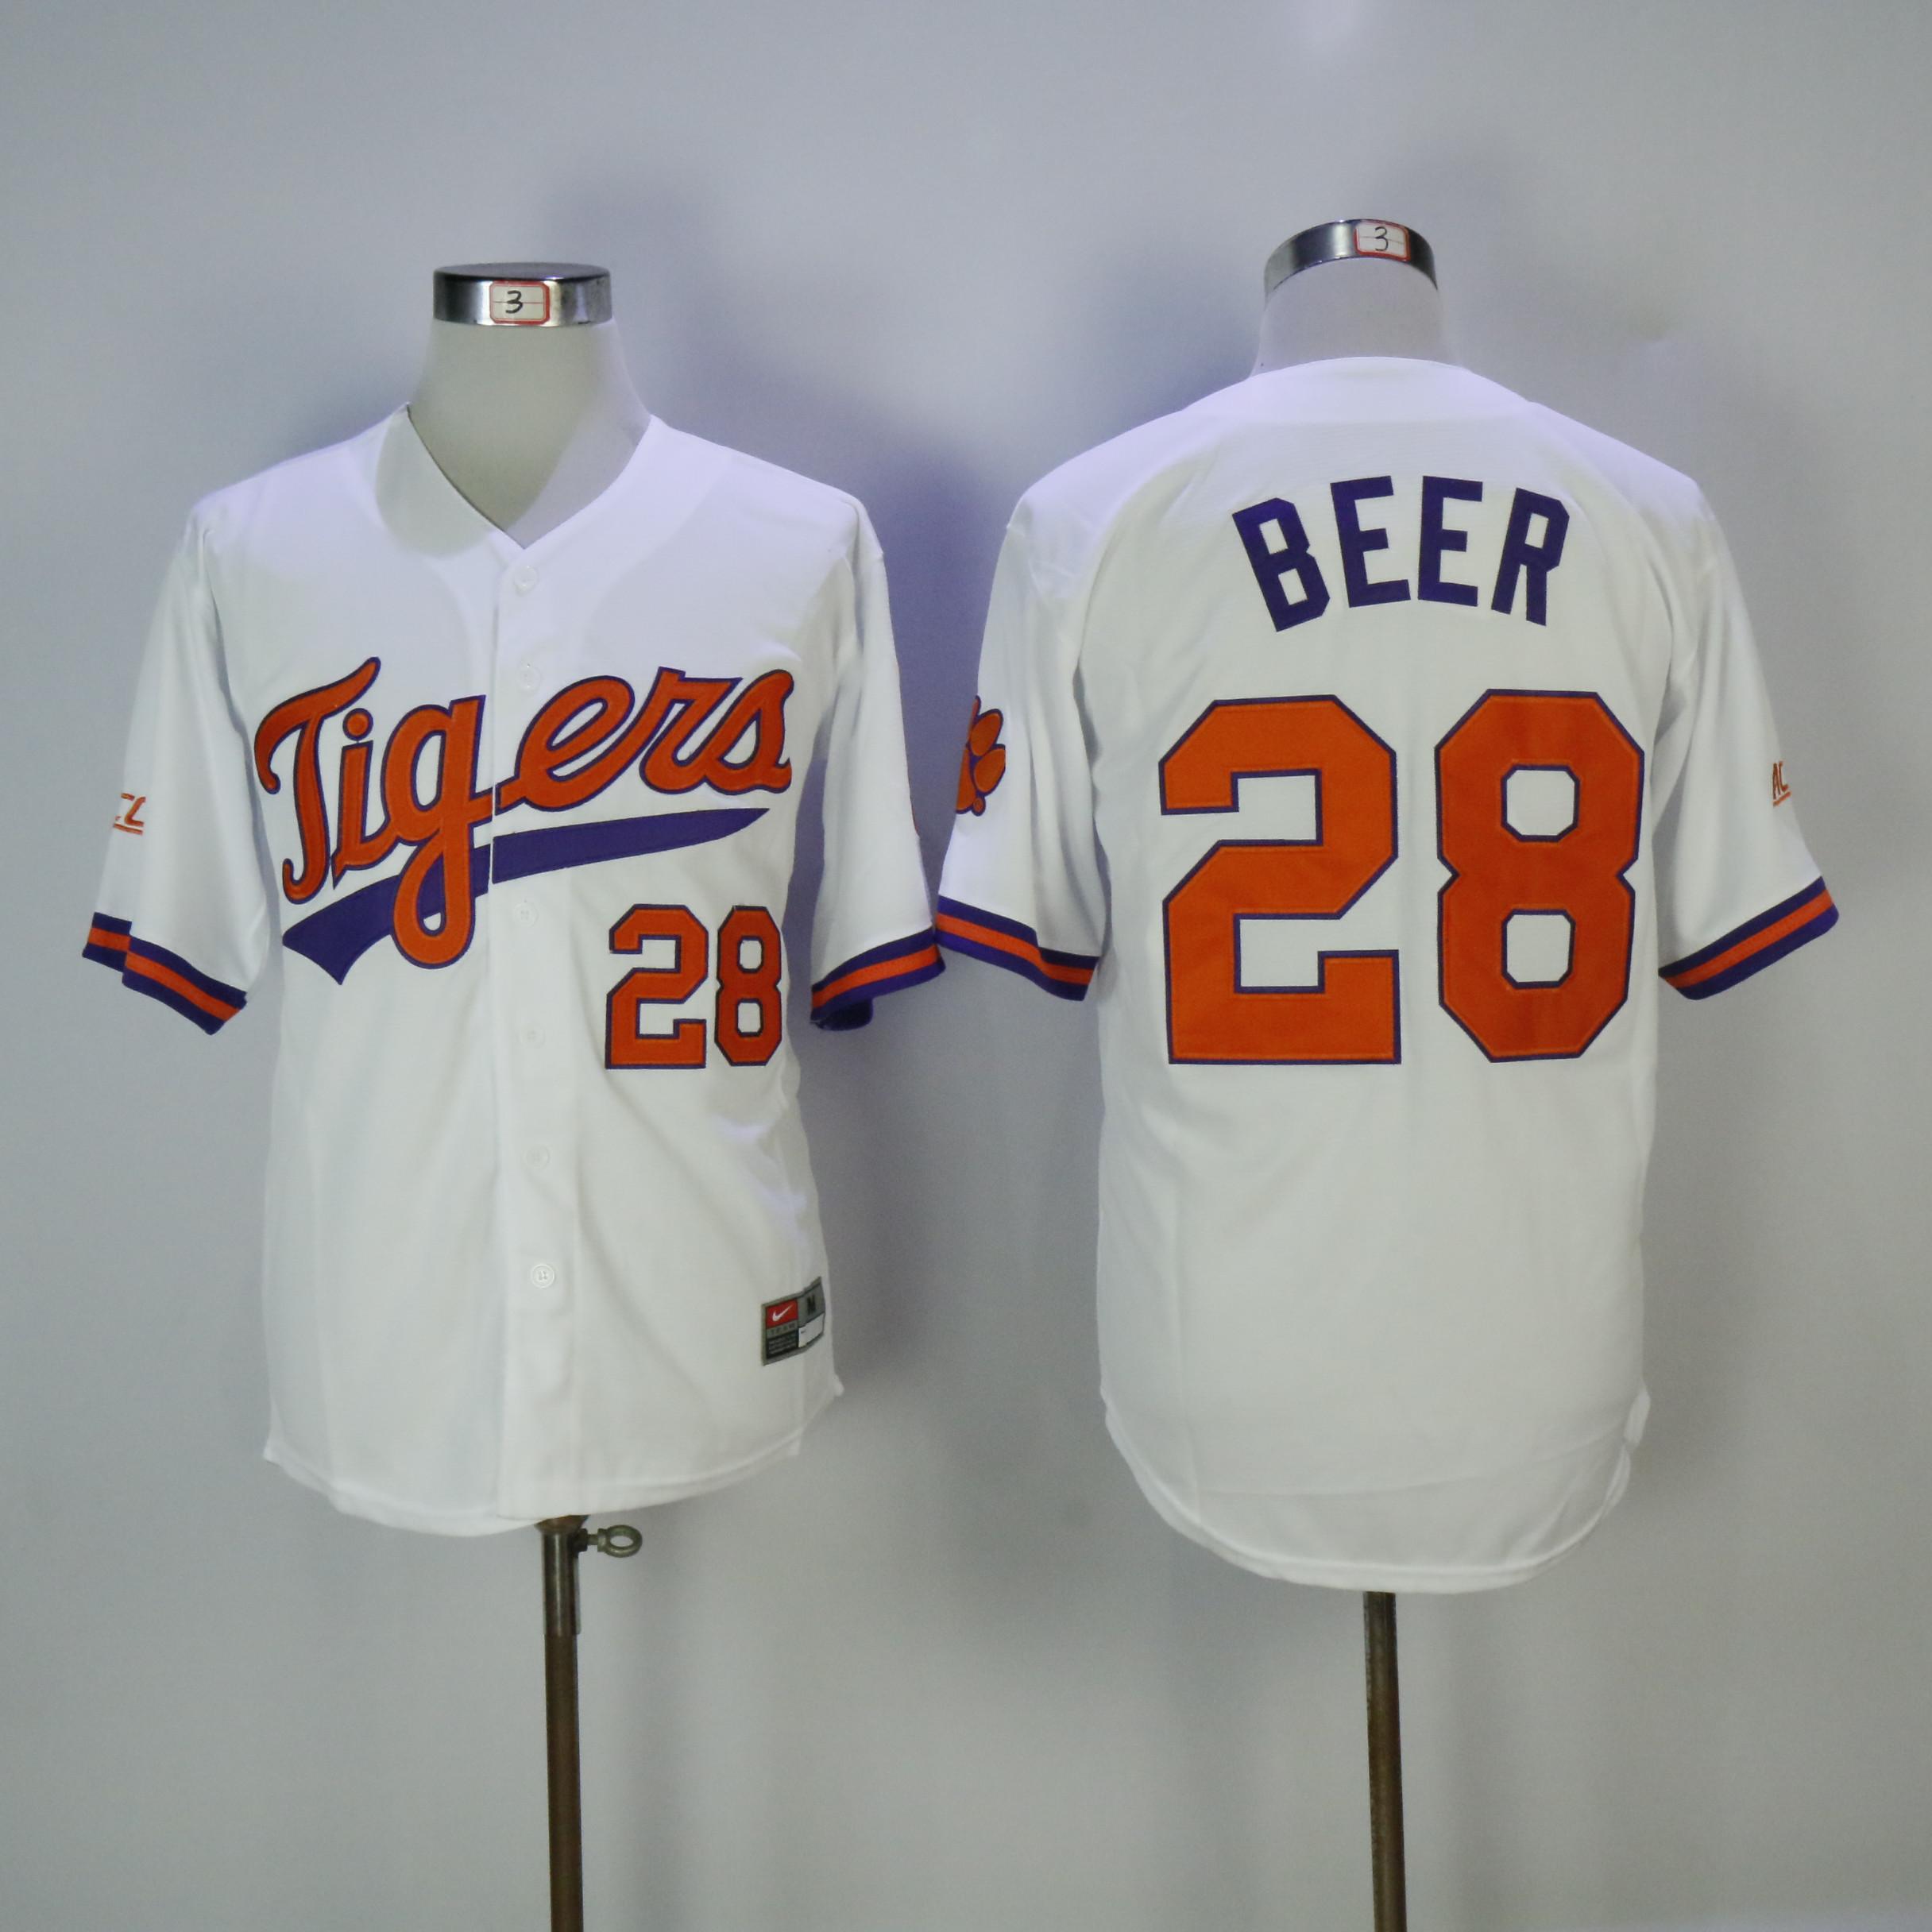 Clemson Tigers 28 Seth Beer White Nike College Baseball Jersey